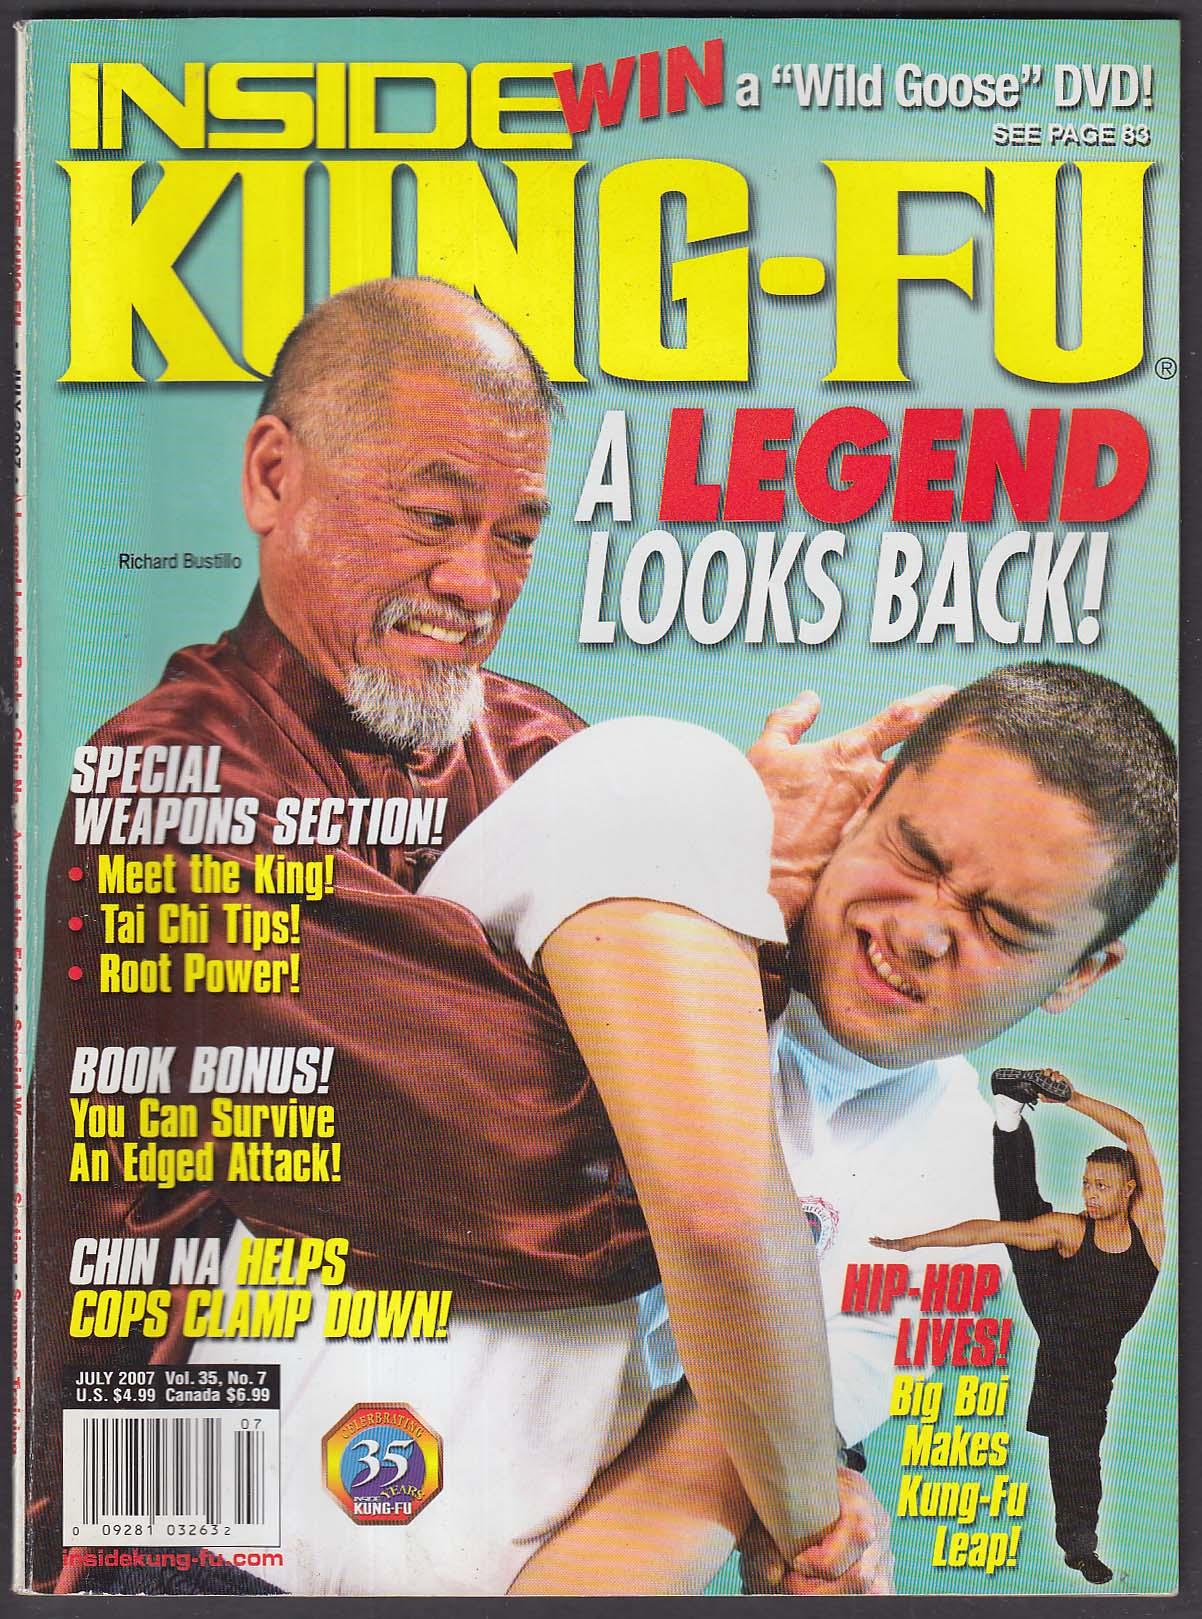 INSIDE KUNG-FU Richard Bustillo OutKast Big Boi Chin Na + 7 2007